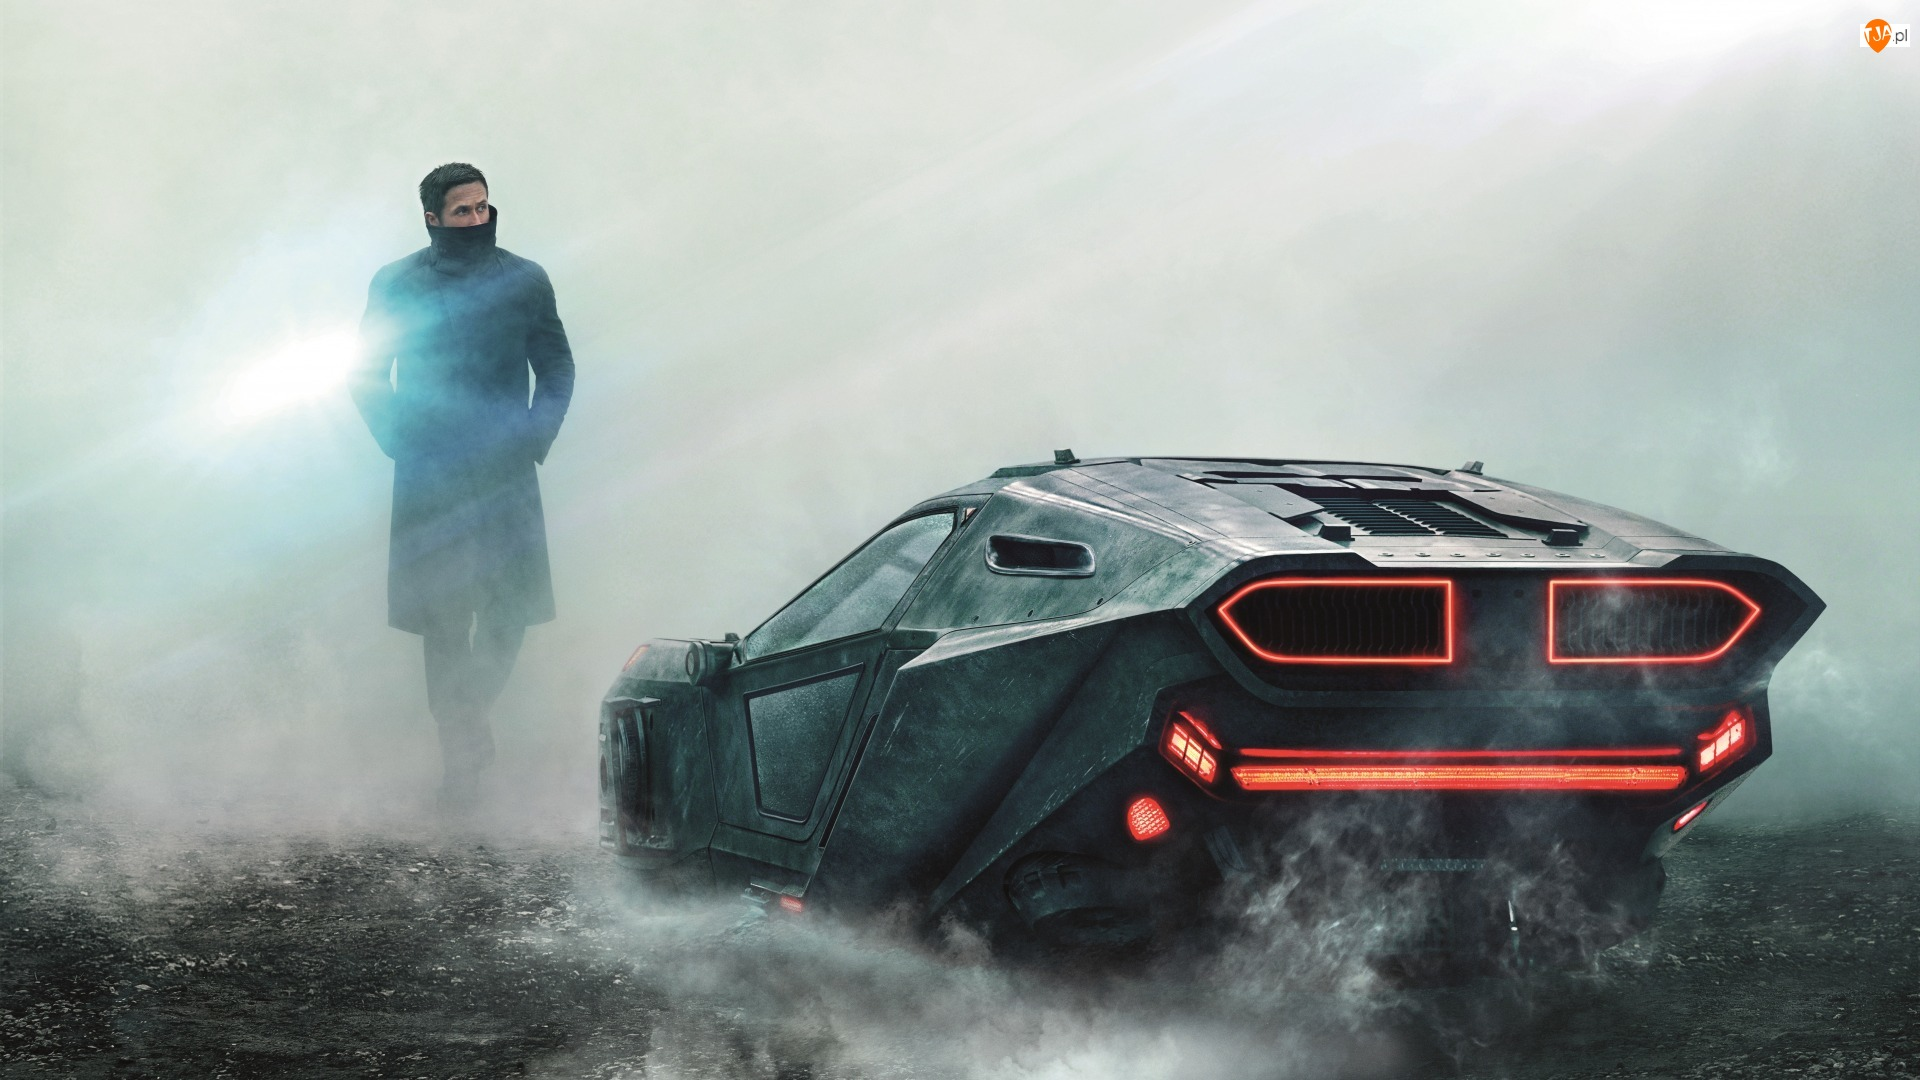 Samochód, Blade Runner 2049 - Łowca androidów, Ryan Gosling